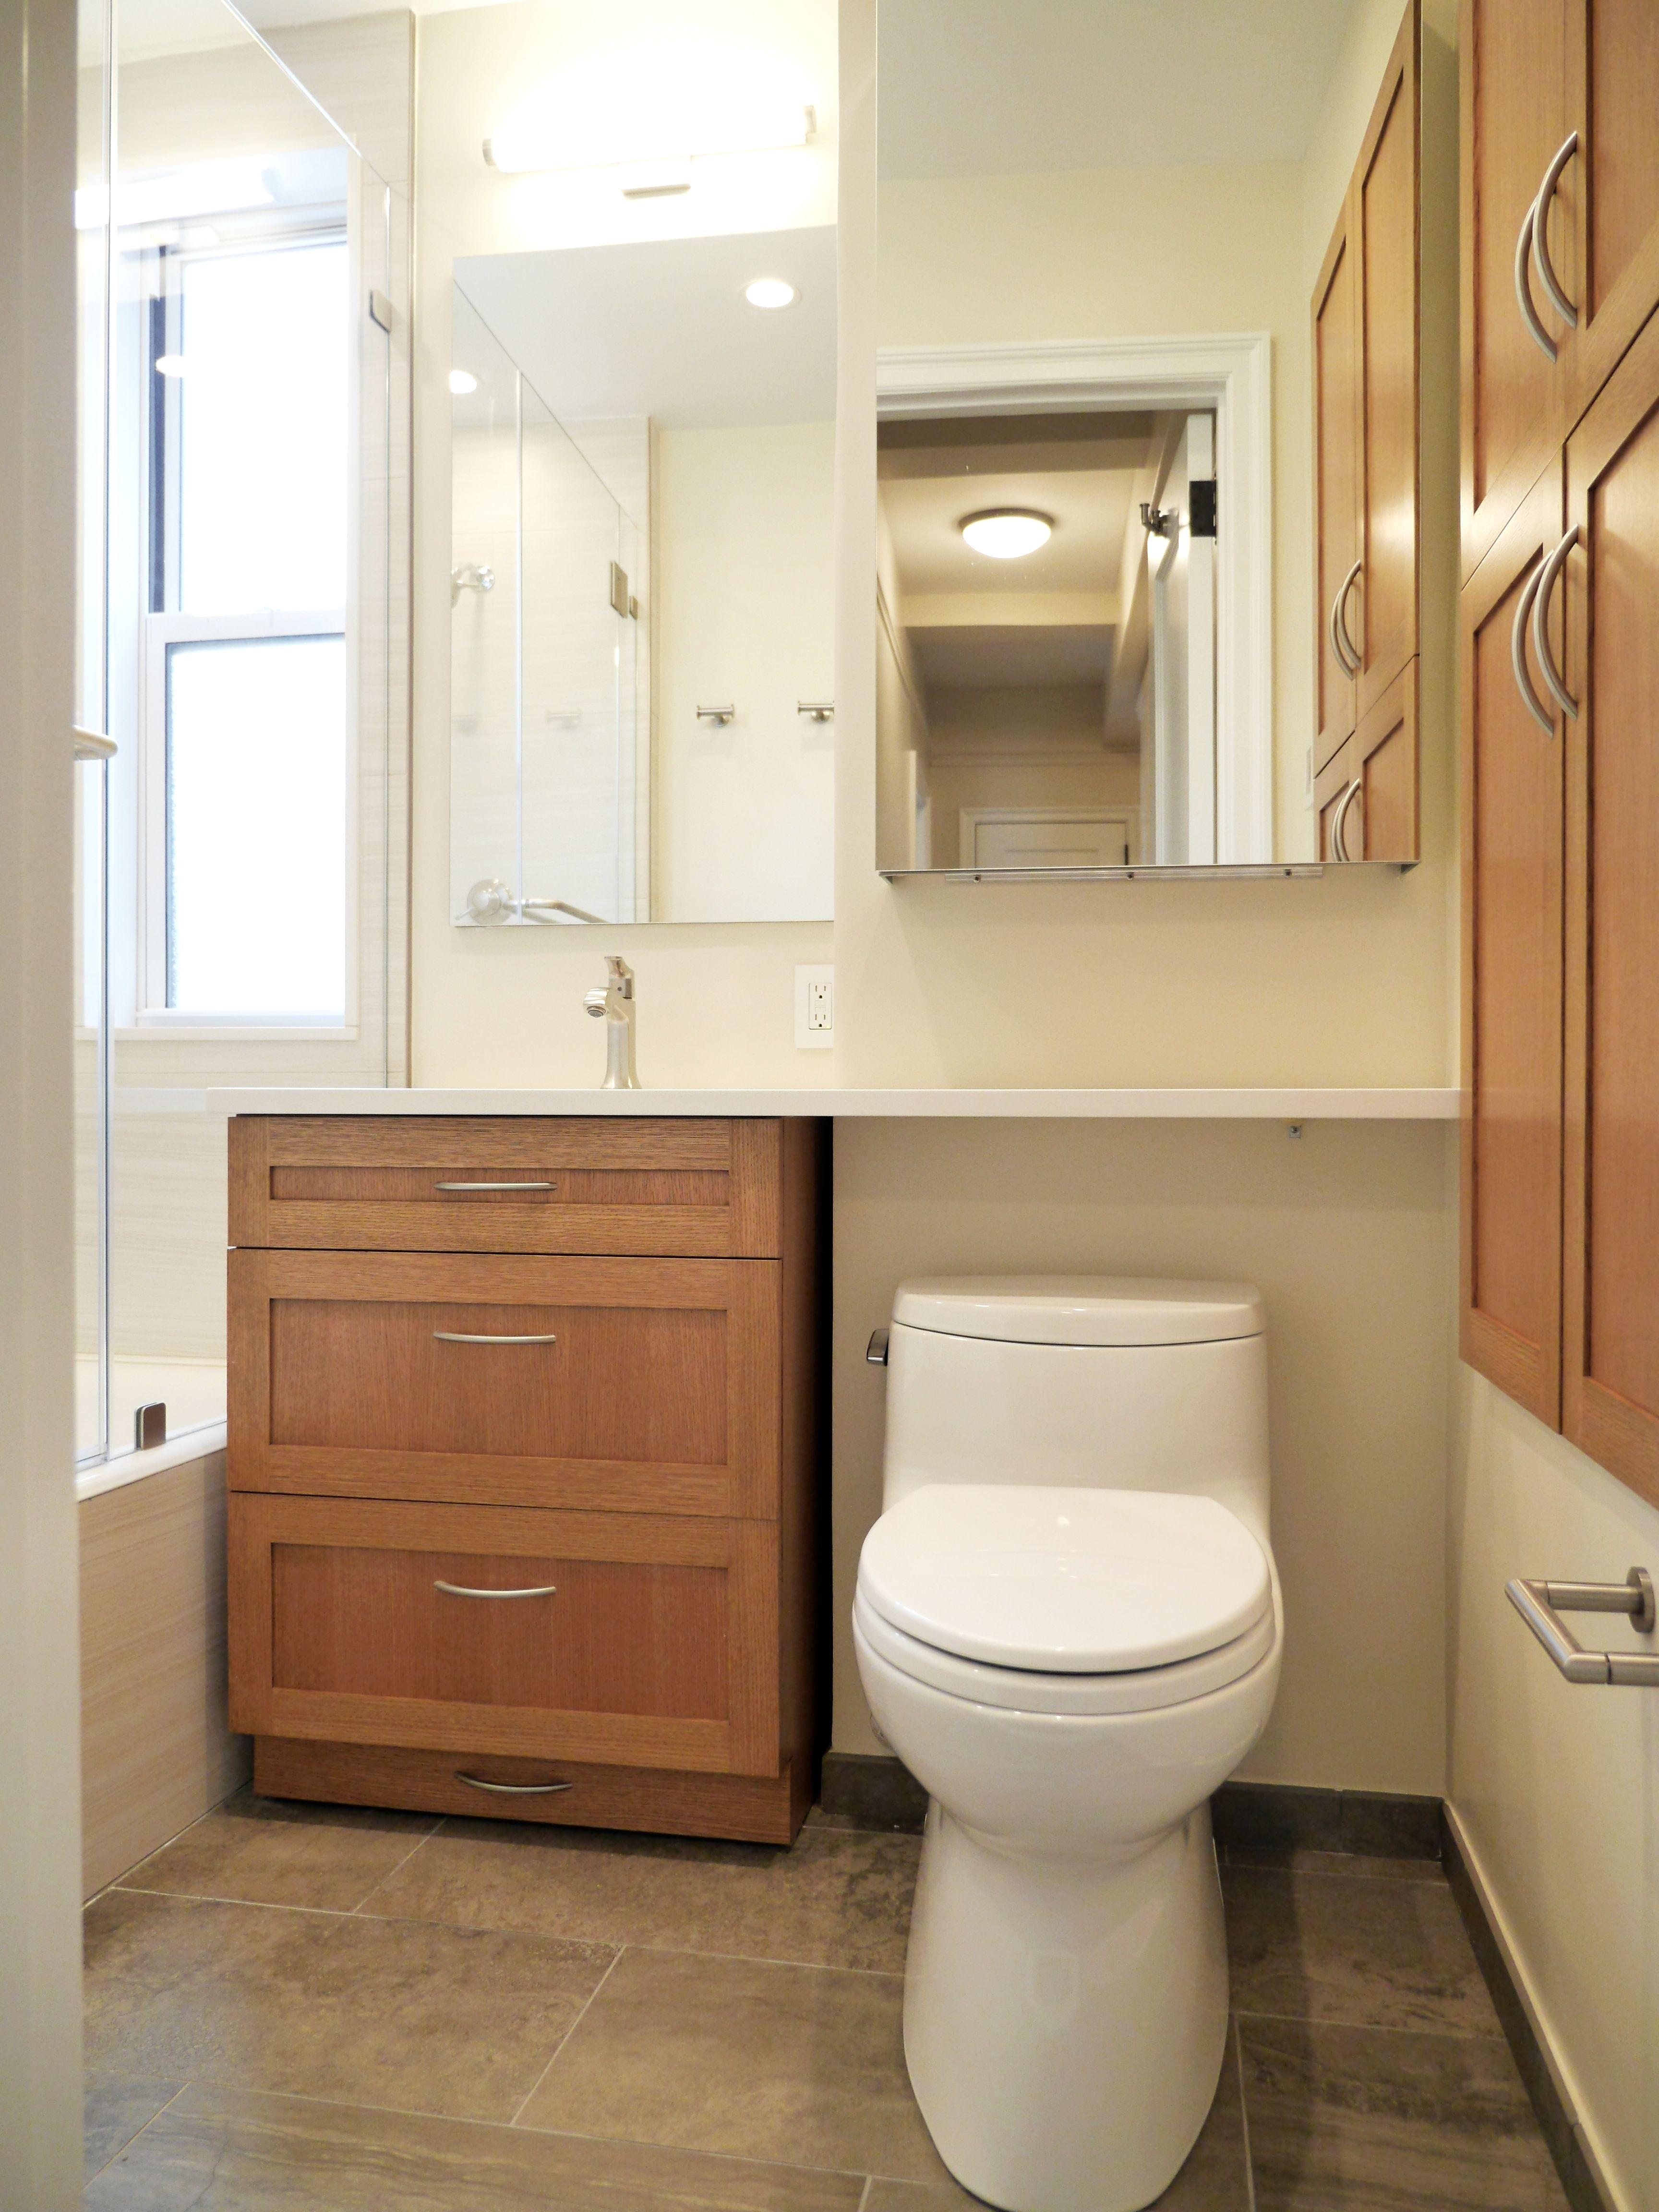 Pin on Custom Vanities   Small Space Bathroom Solutions